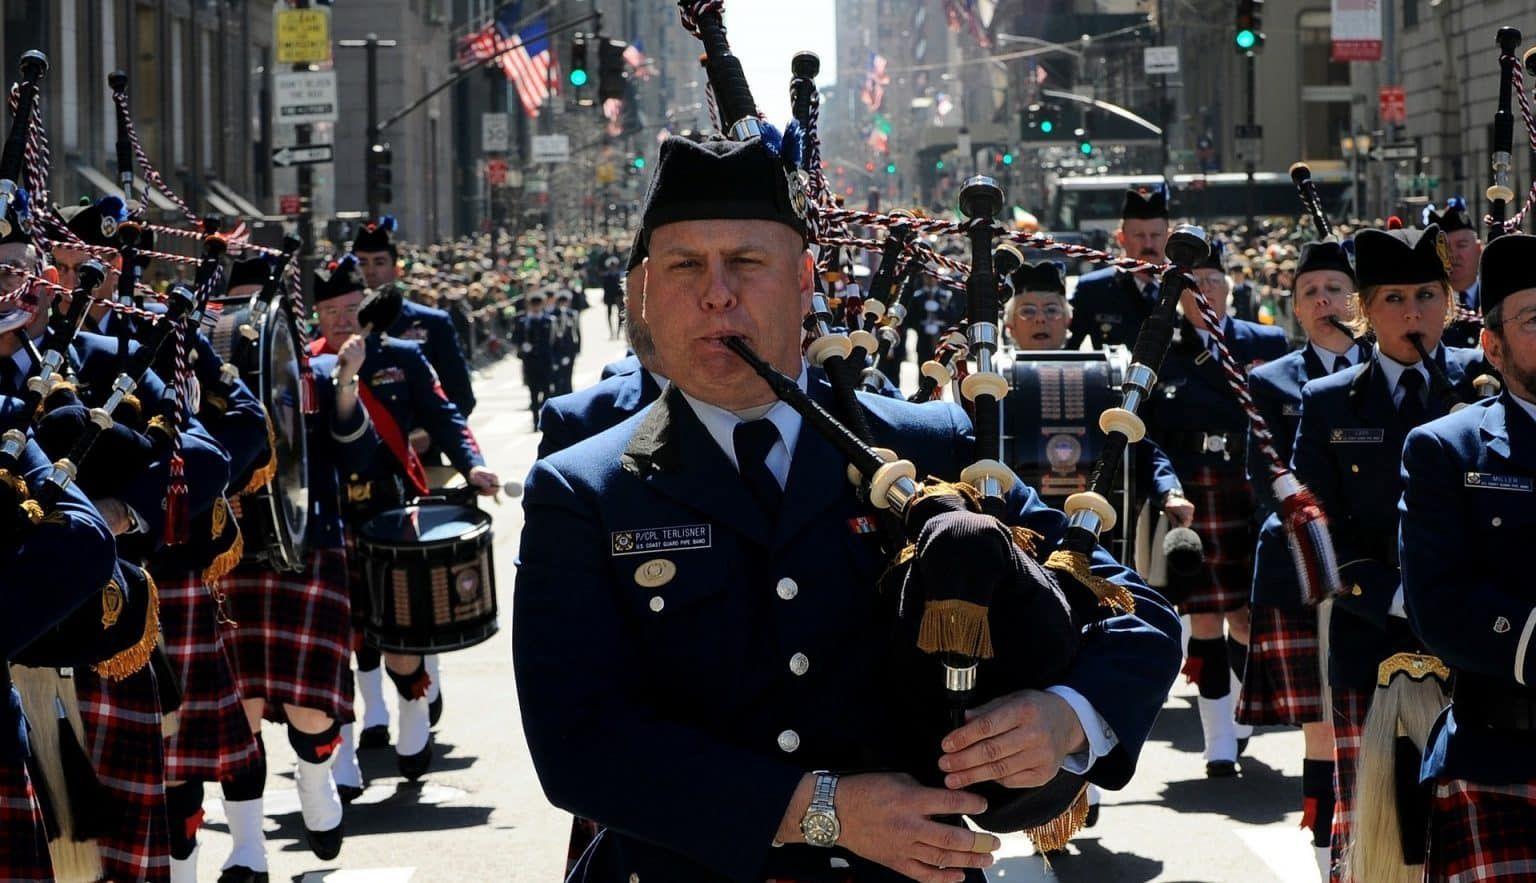 St. Patrick's Day Parade 2020